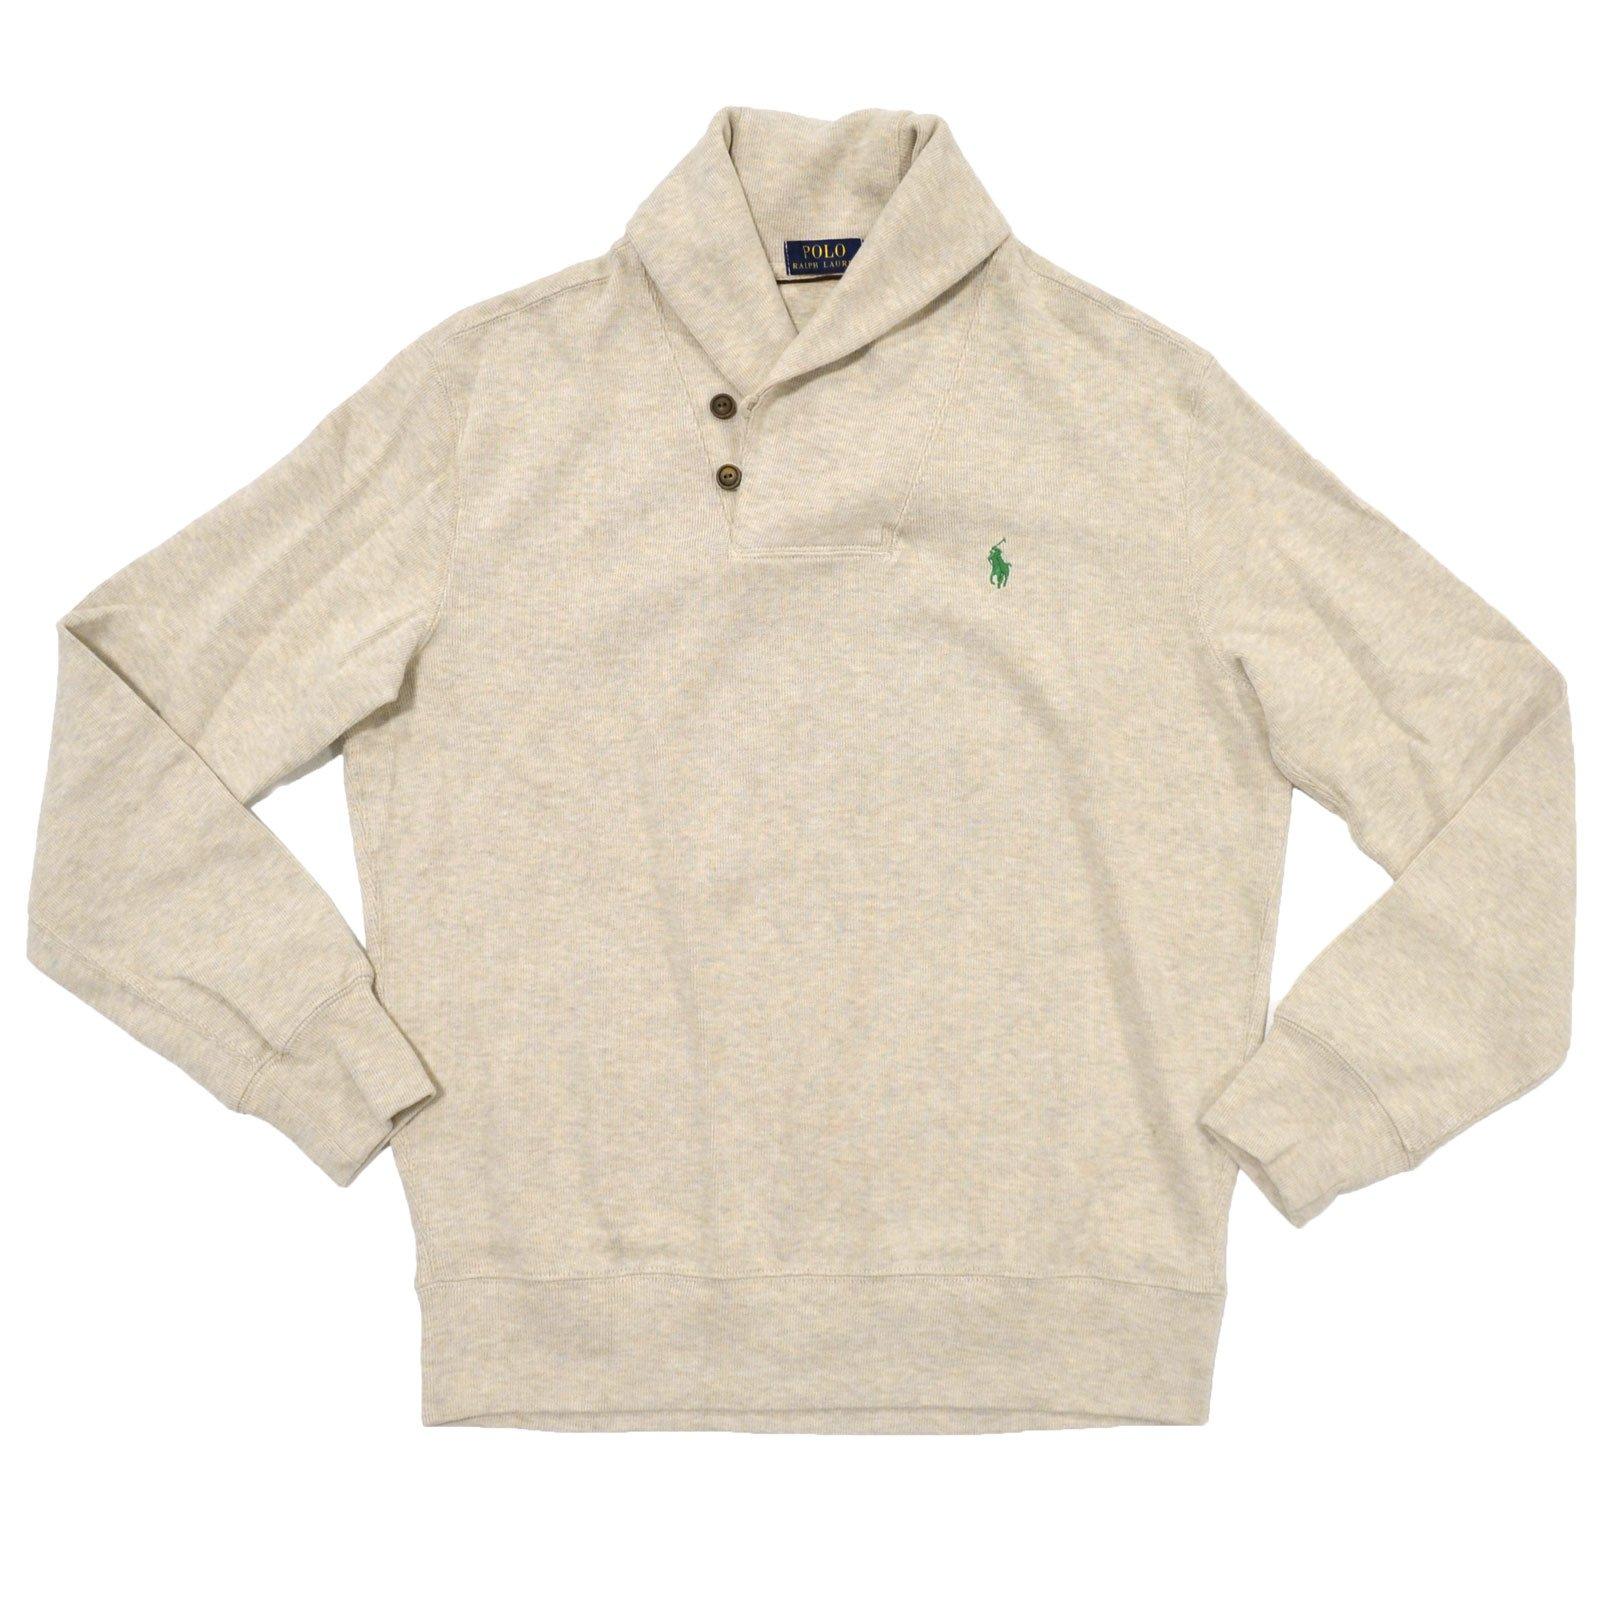 Polo Ralph Lauren Mens French Rib Shawl Neck Sweater (Small, Almond Heather)